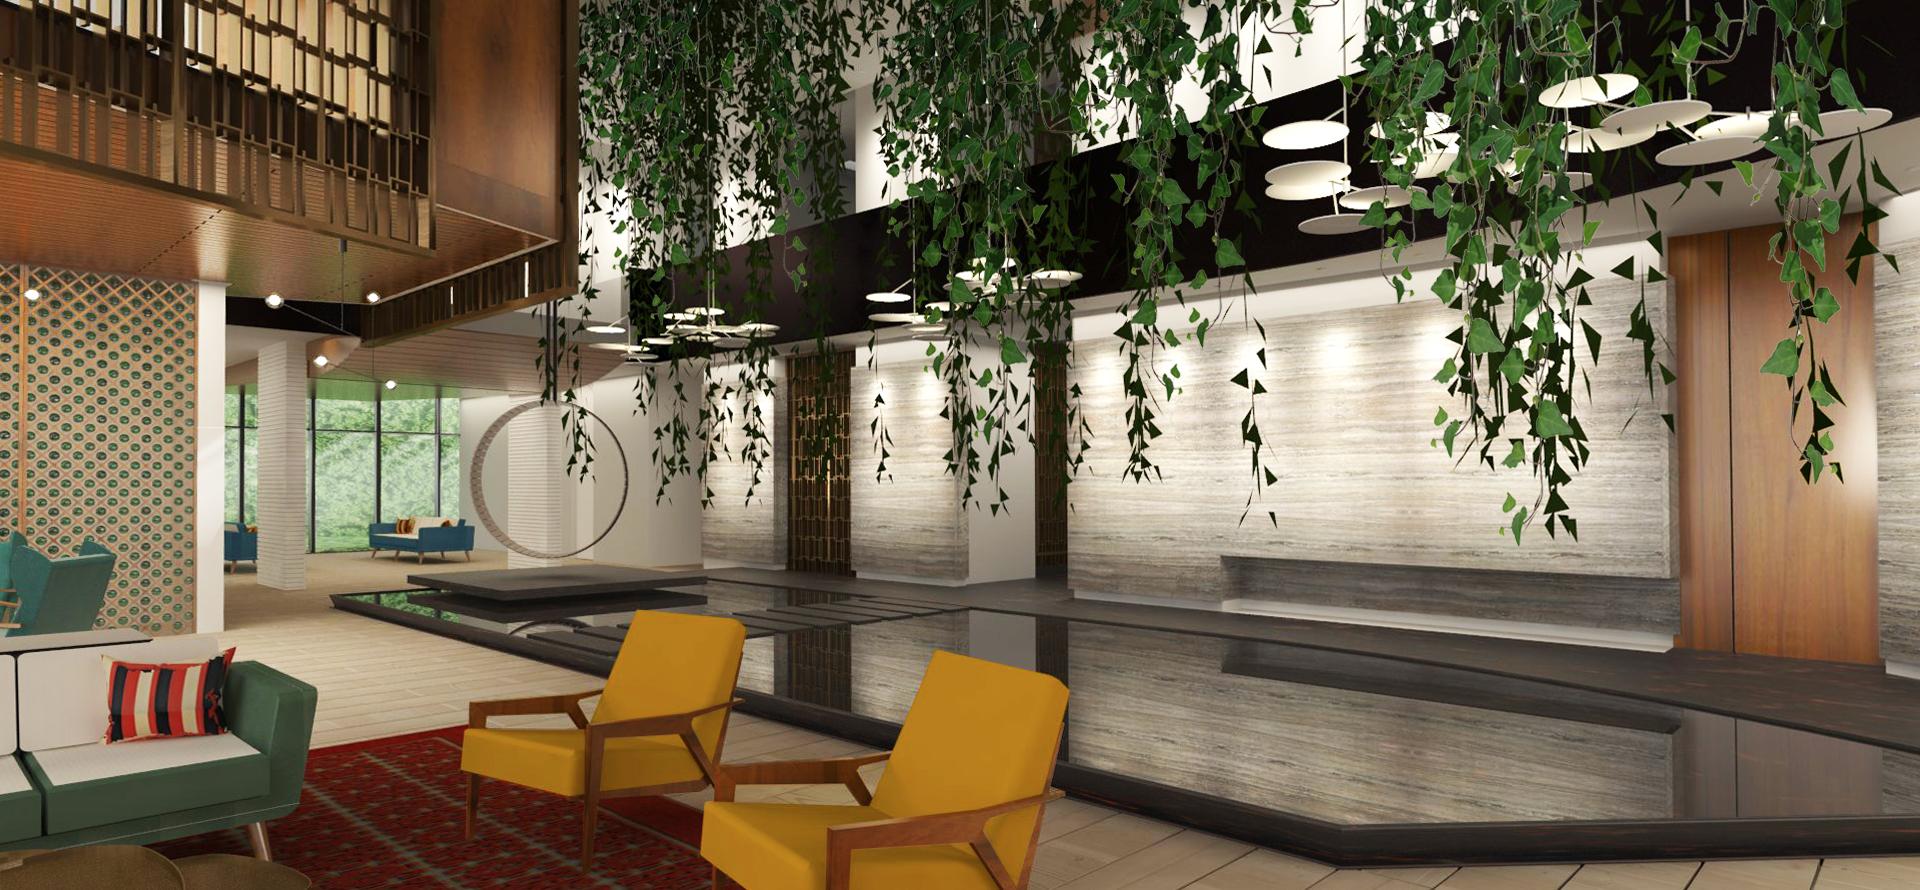 luis-pons-design-interior-tropical-Miami-Beach_2.jpg